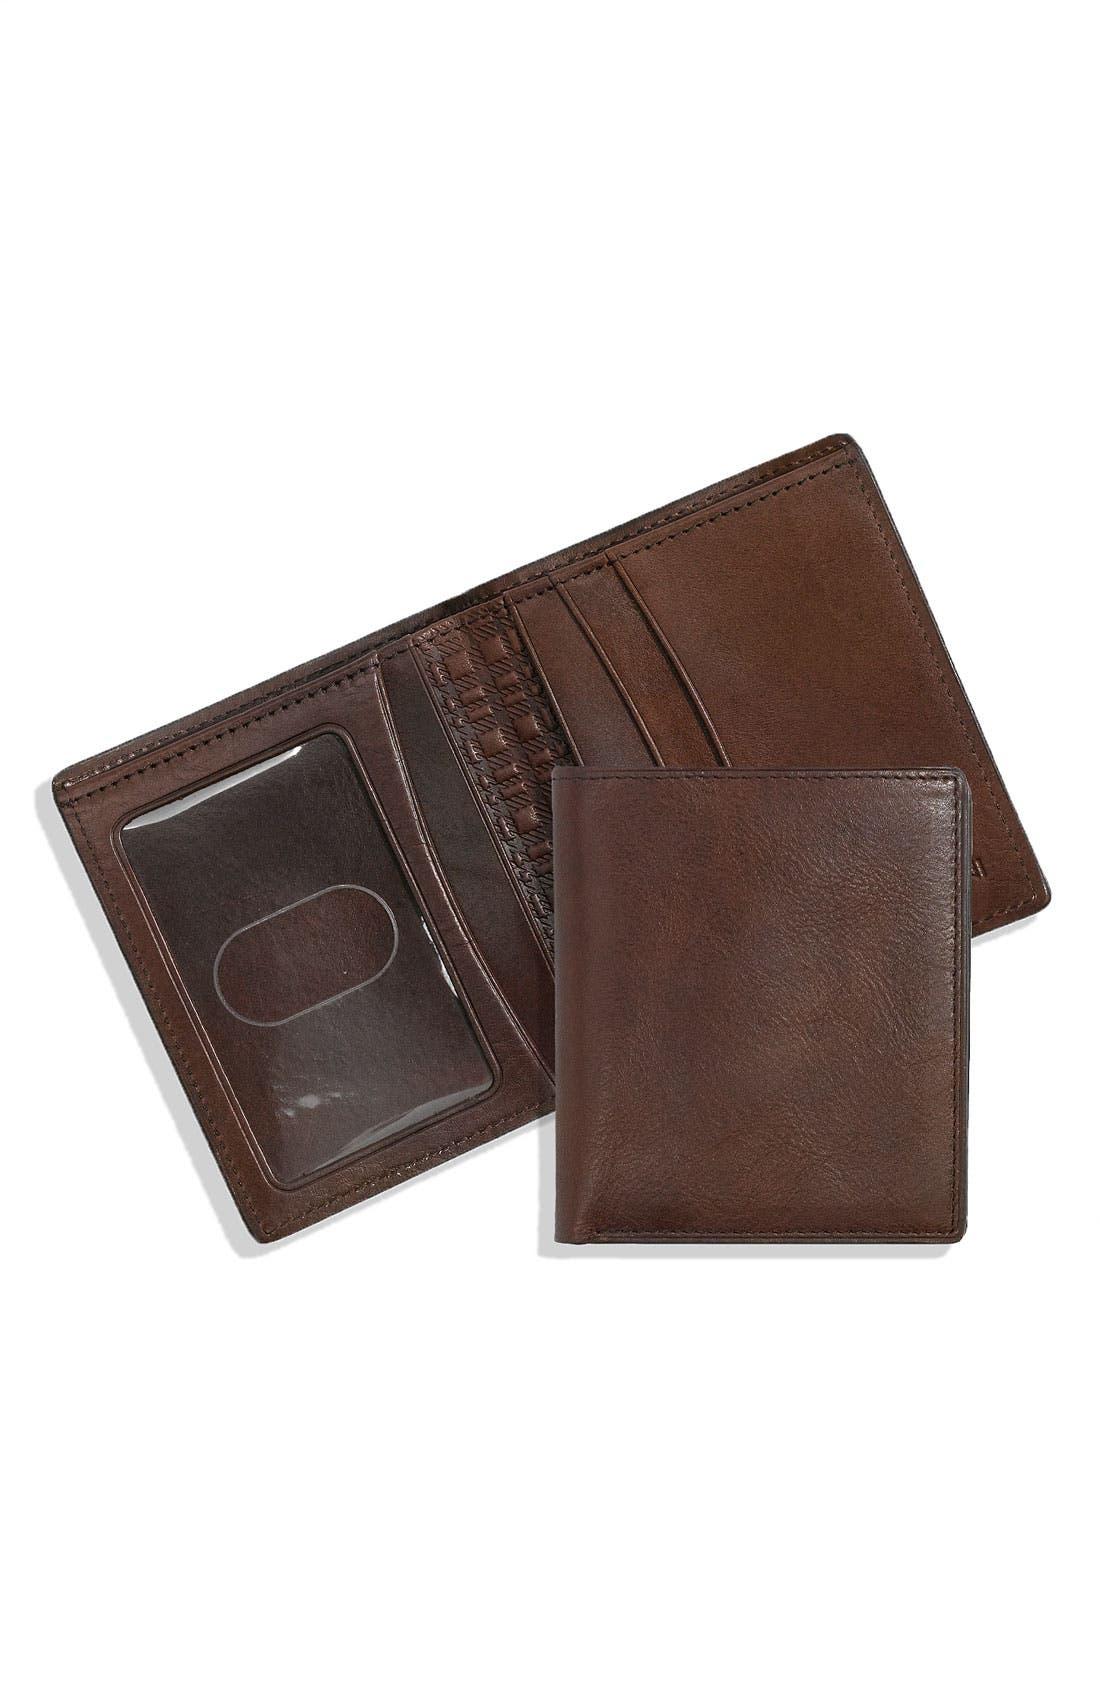 Alternate Image 1 Selected - Boconi 'Rinaldo' Compact Wallet